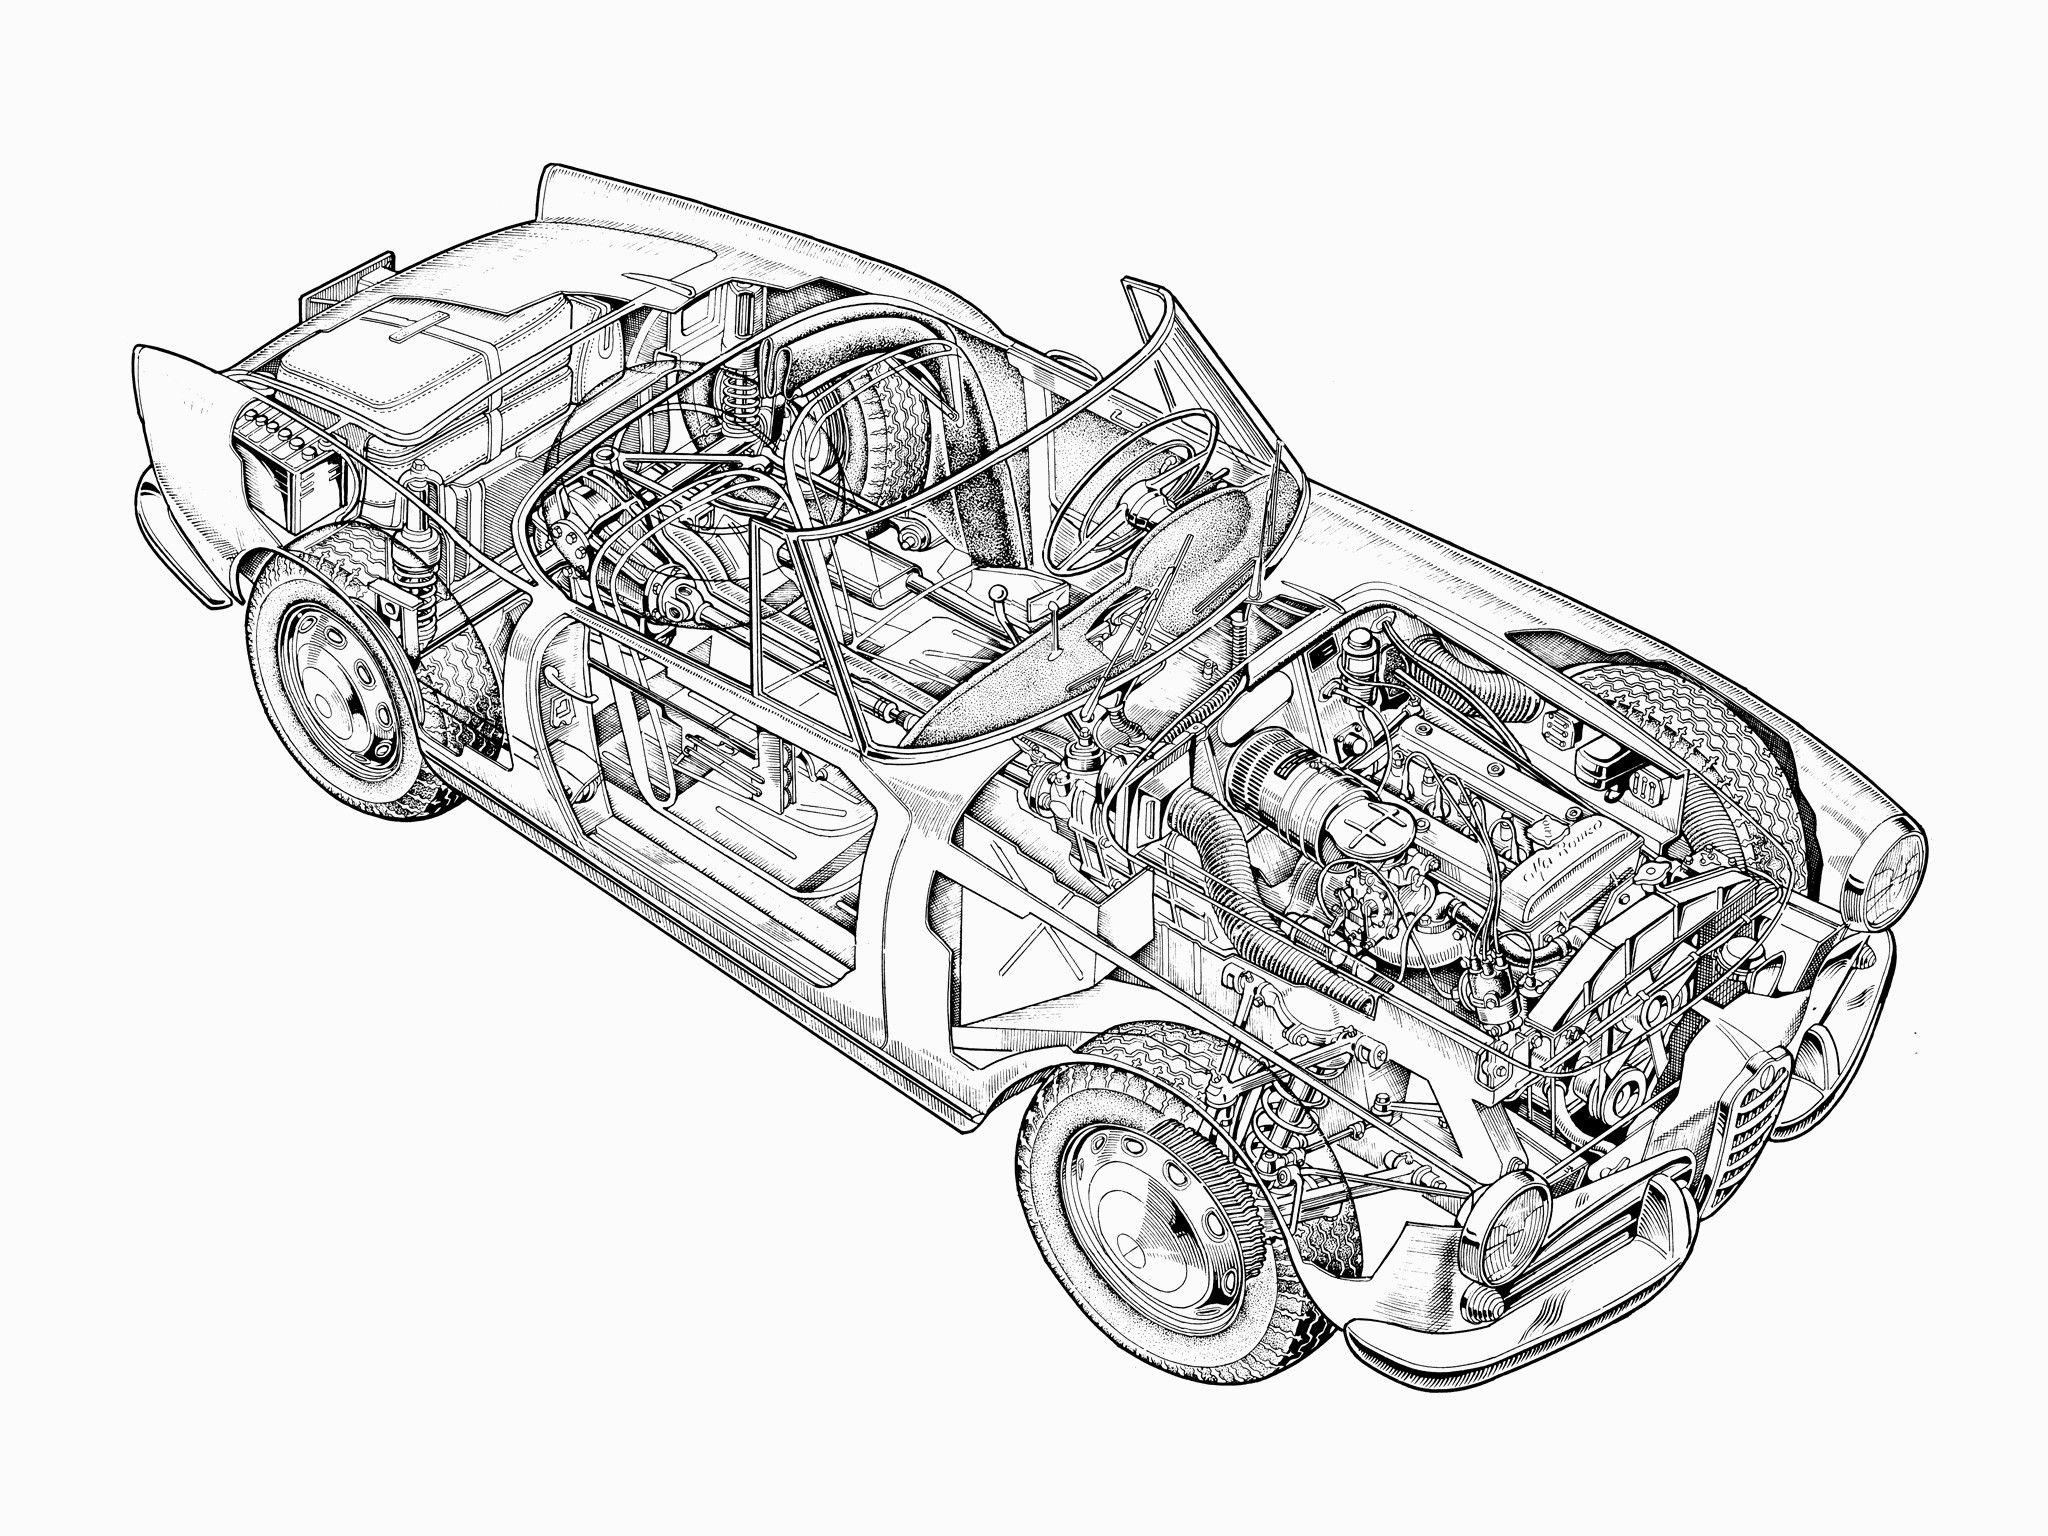 1956-1962 Alfa Romeo Giulietta Spider (750-101) desinged